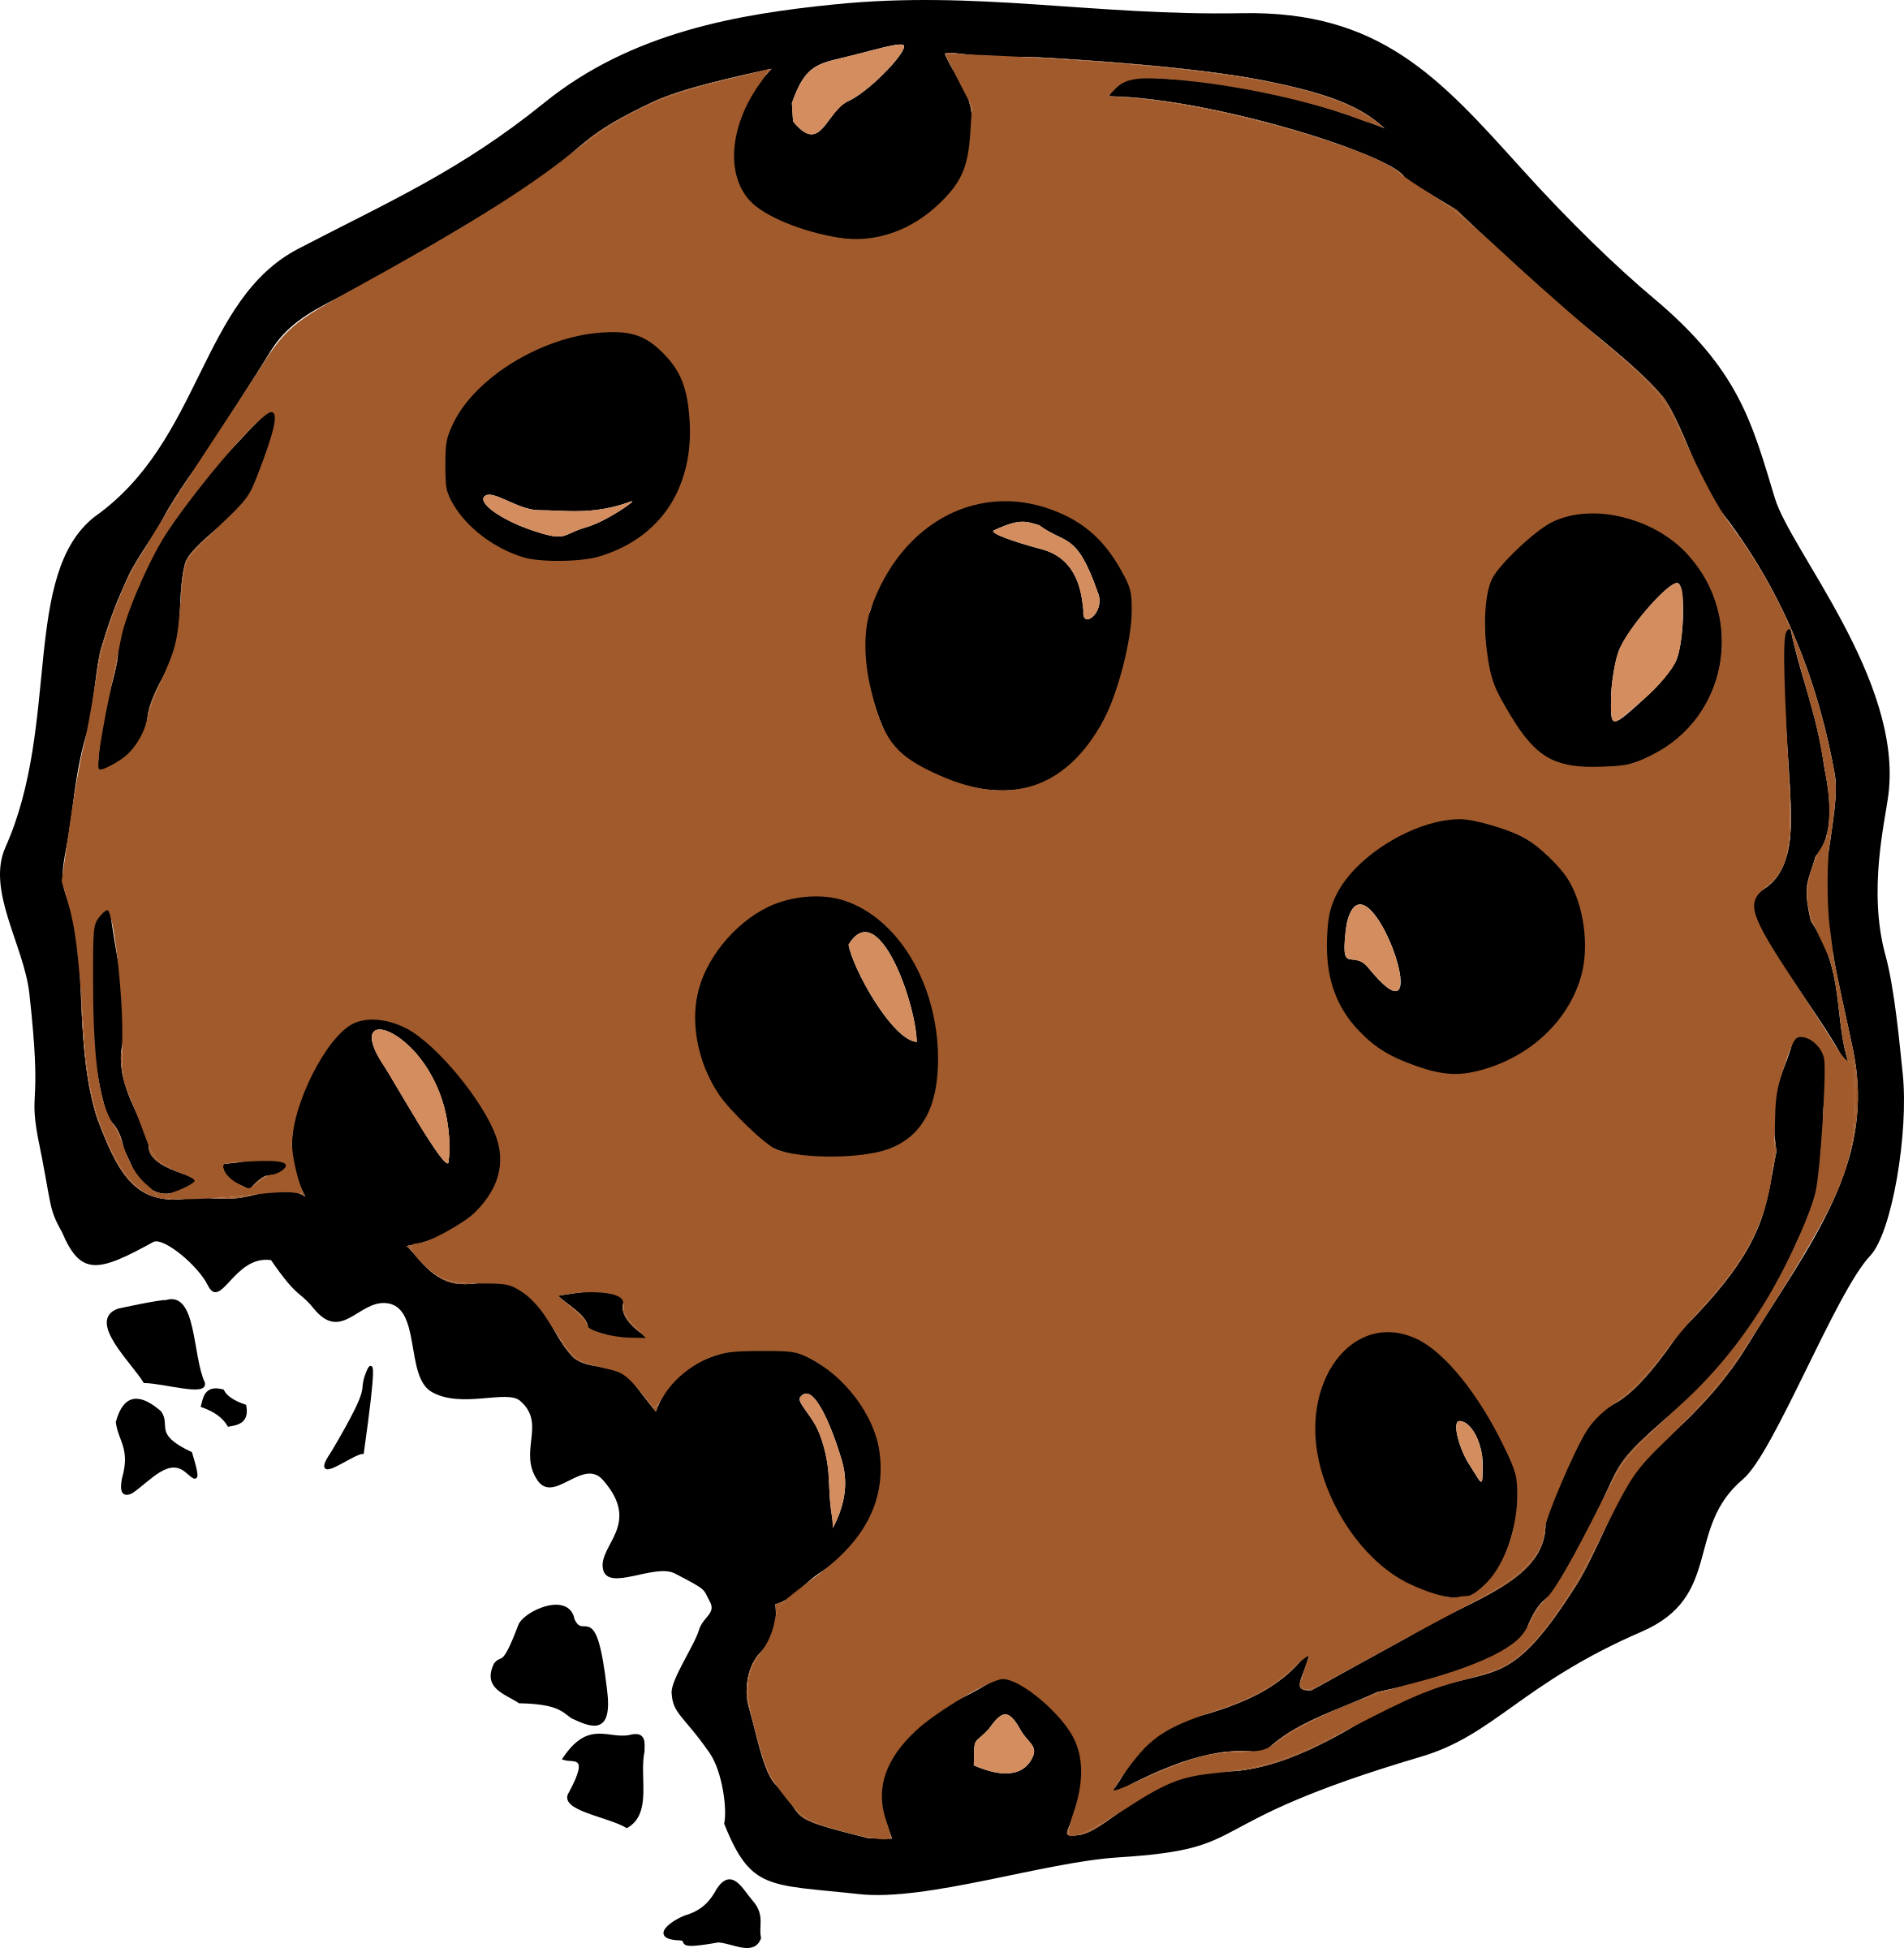 Cookies clipart.